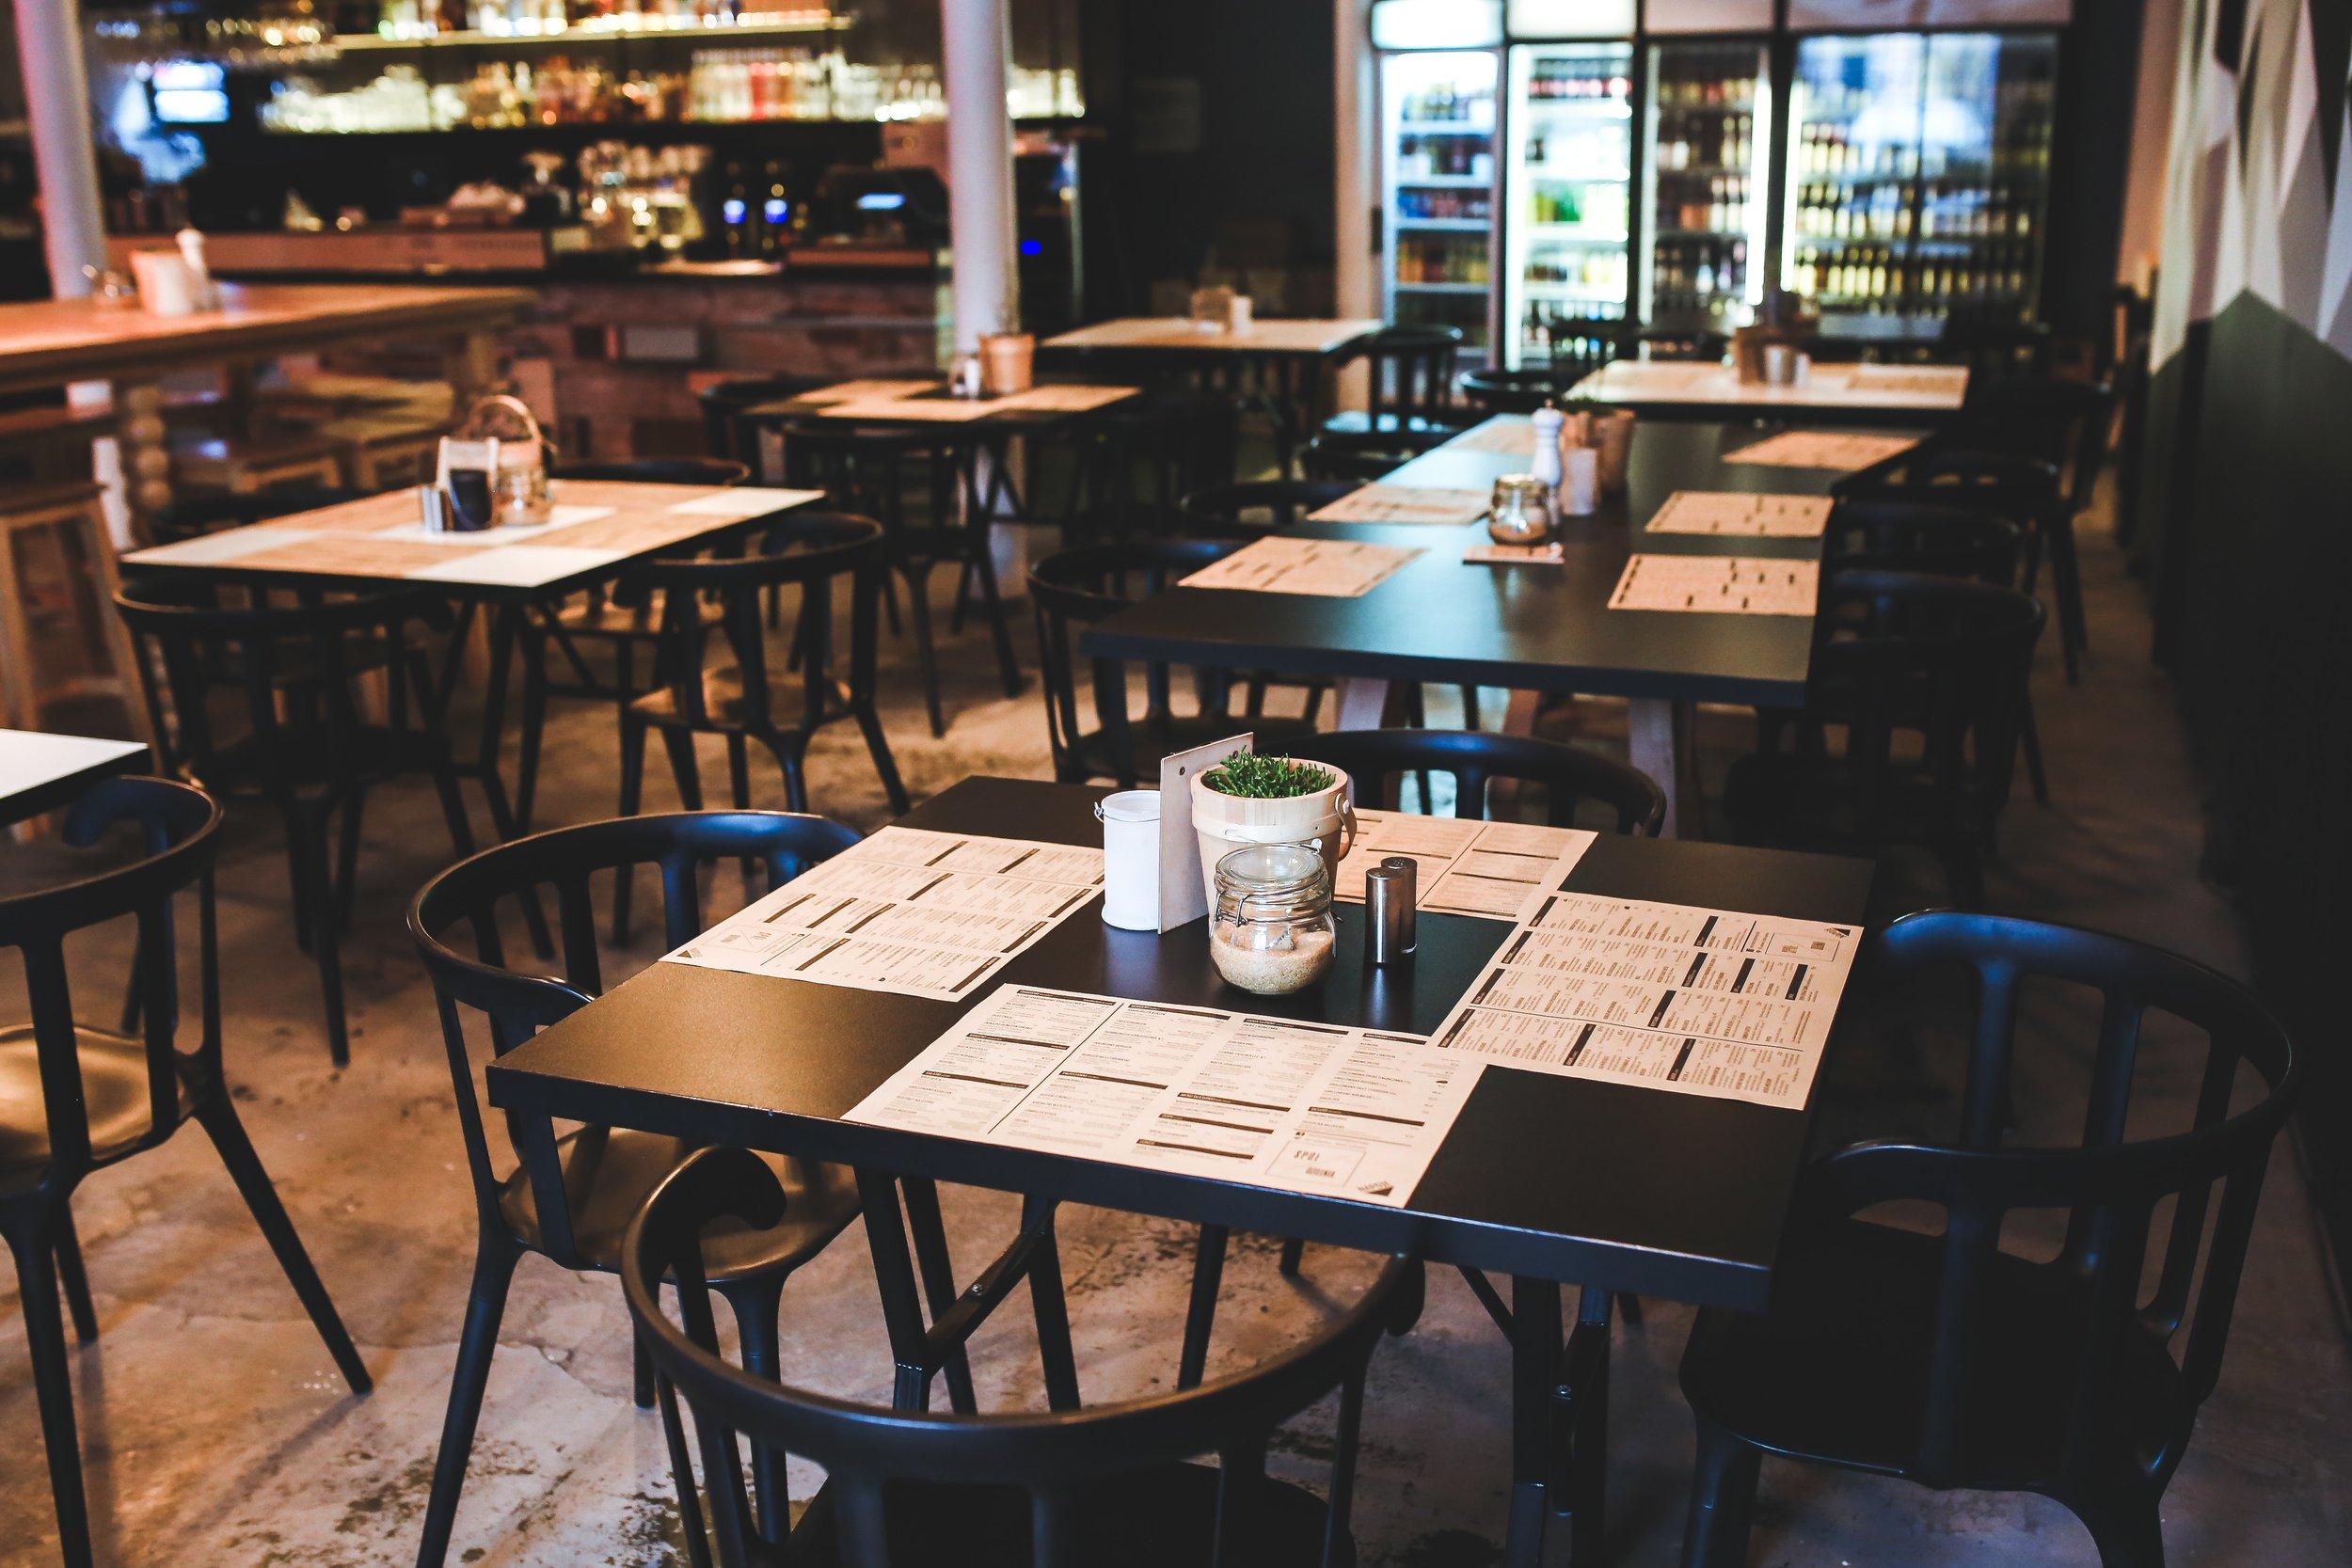 cafe-chairs-menu-6267.jpg